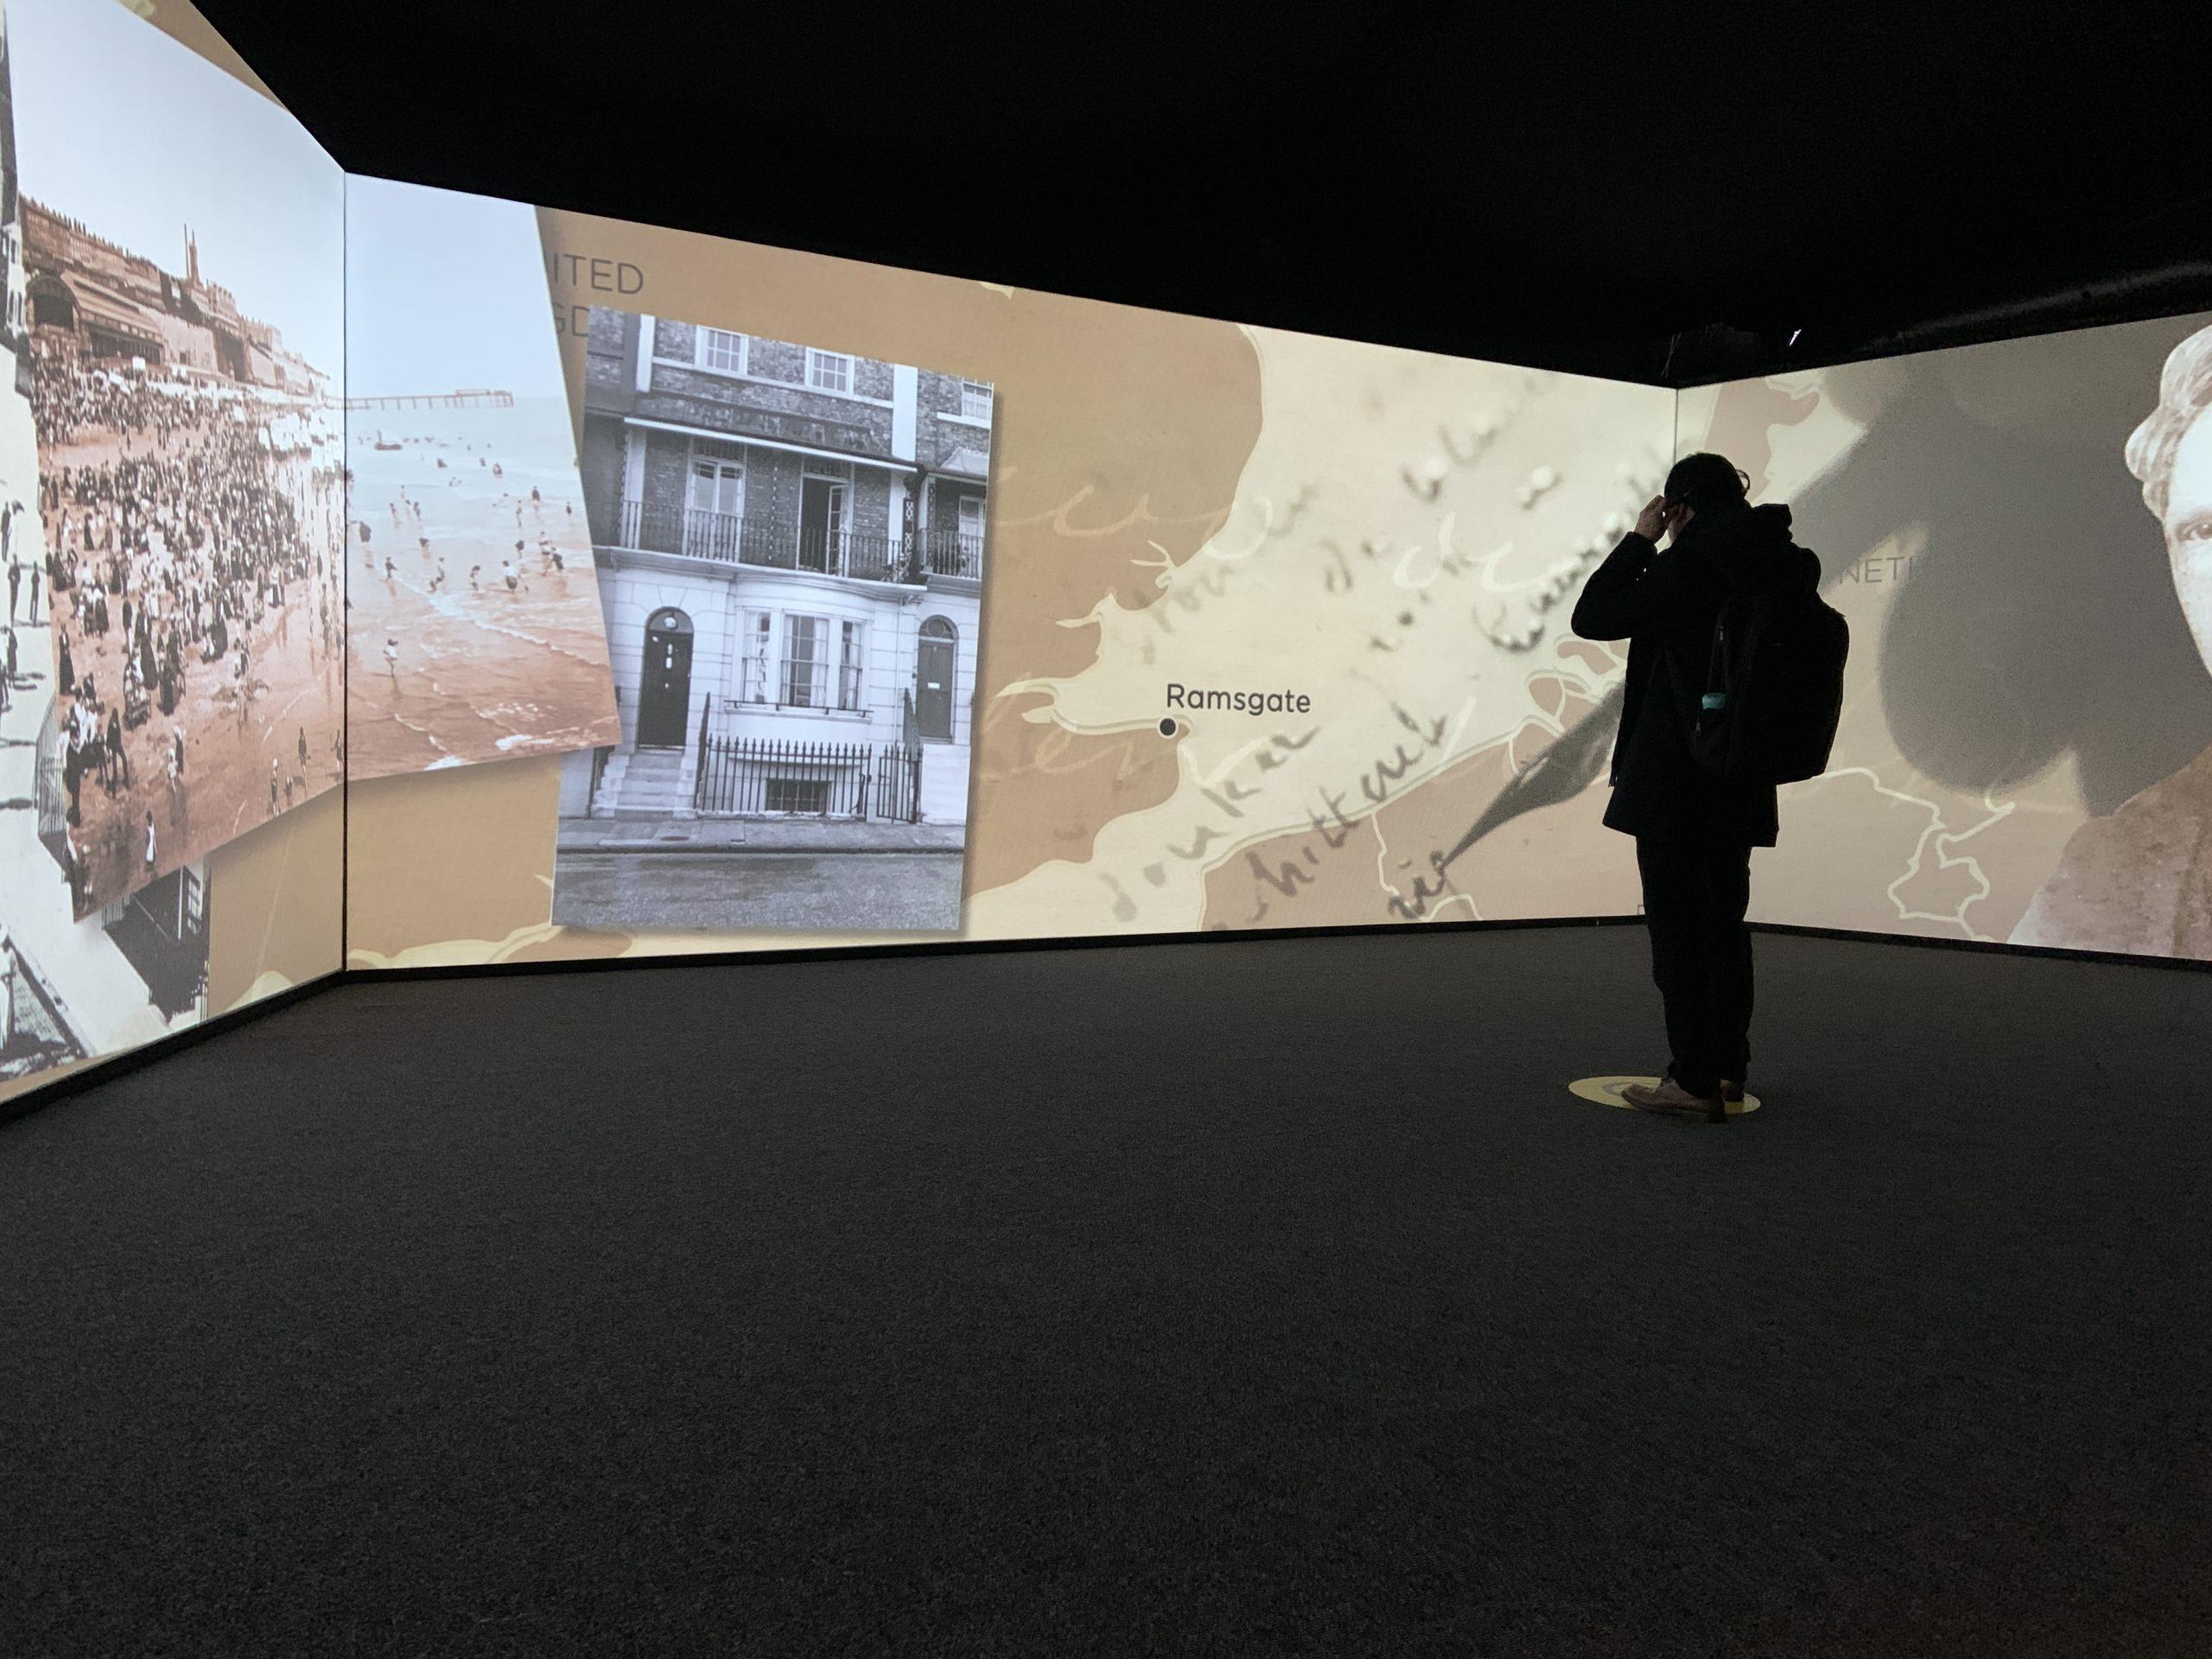 Meet Vincent Van Gogh - the introductory film